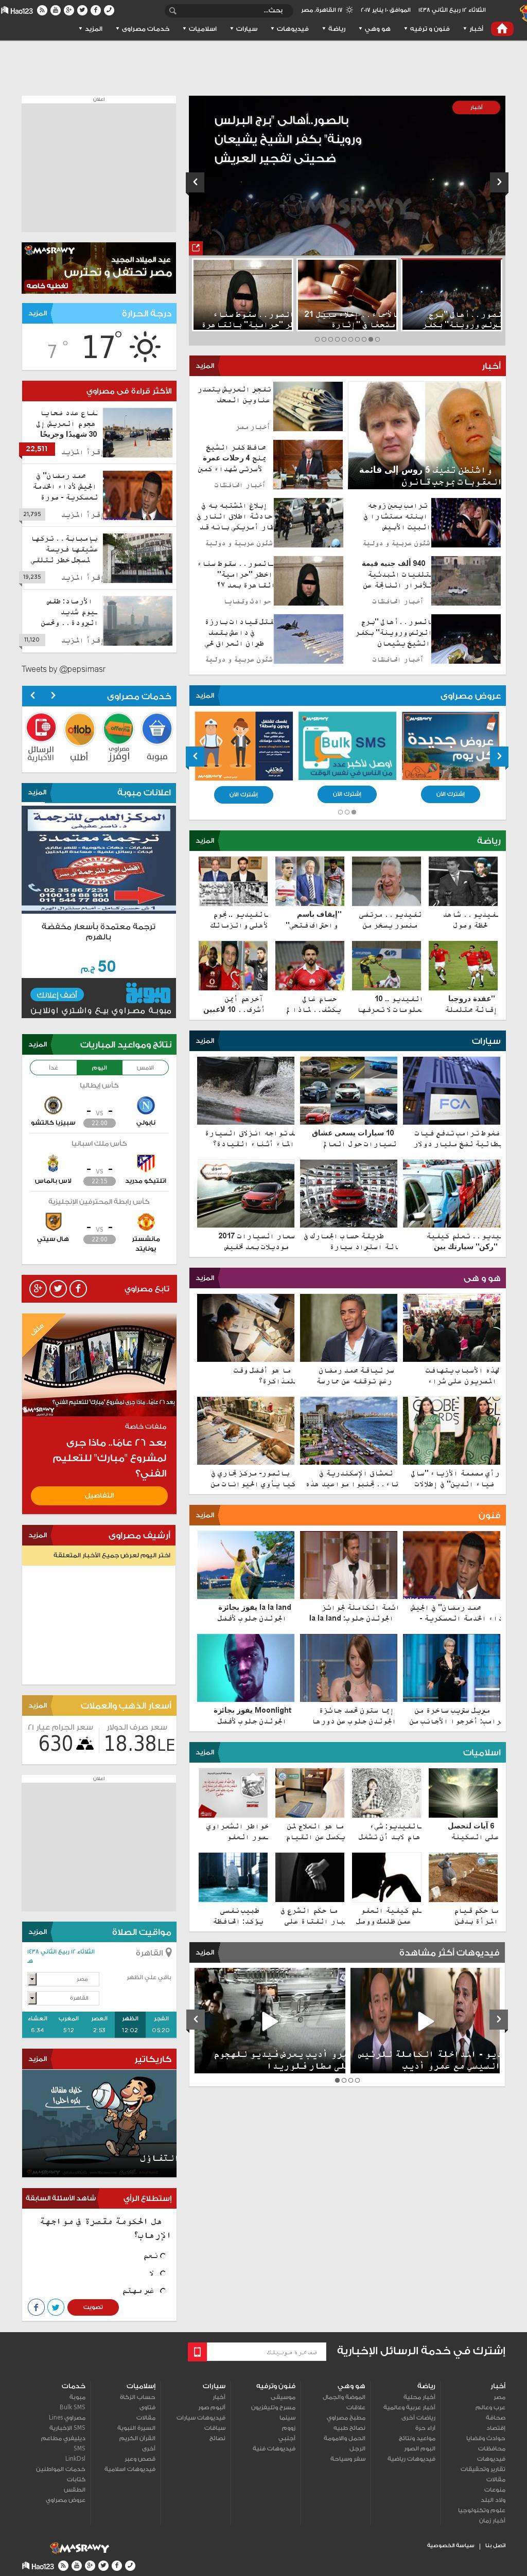 Masrawy at Tuesday Jan. 10, 2017, 6:12 a.m. UTC